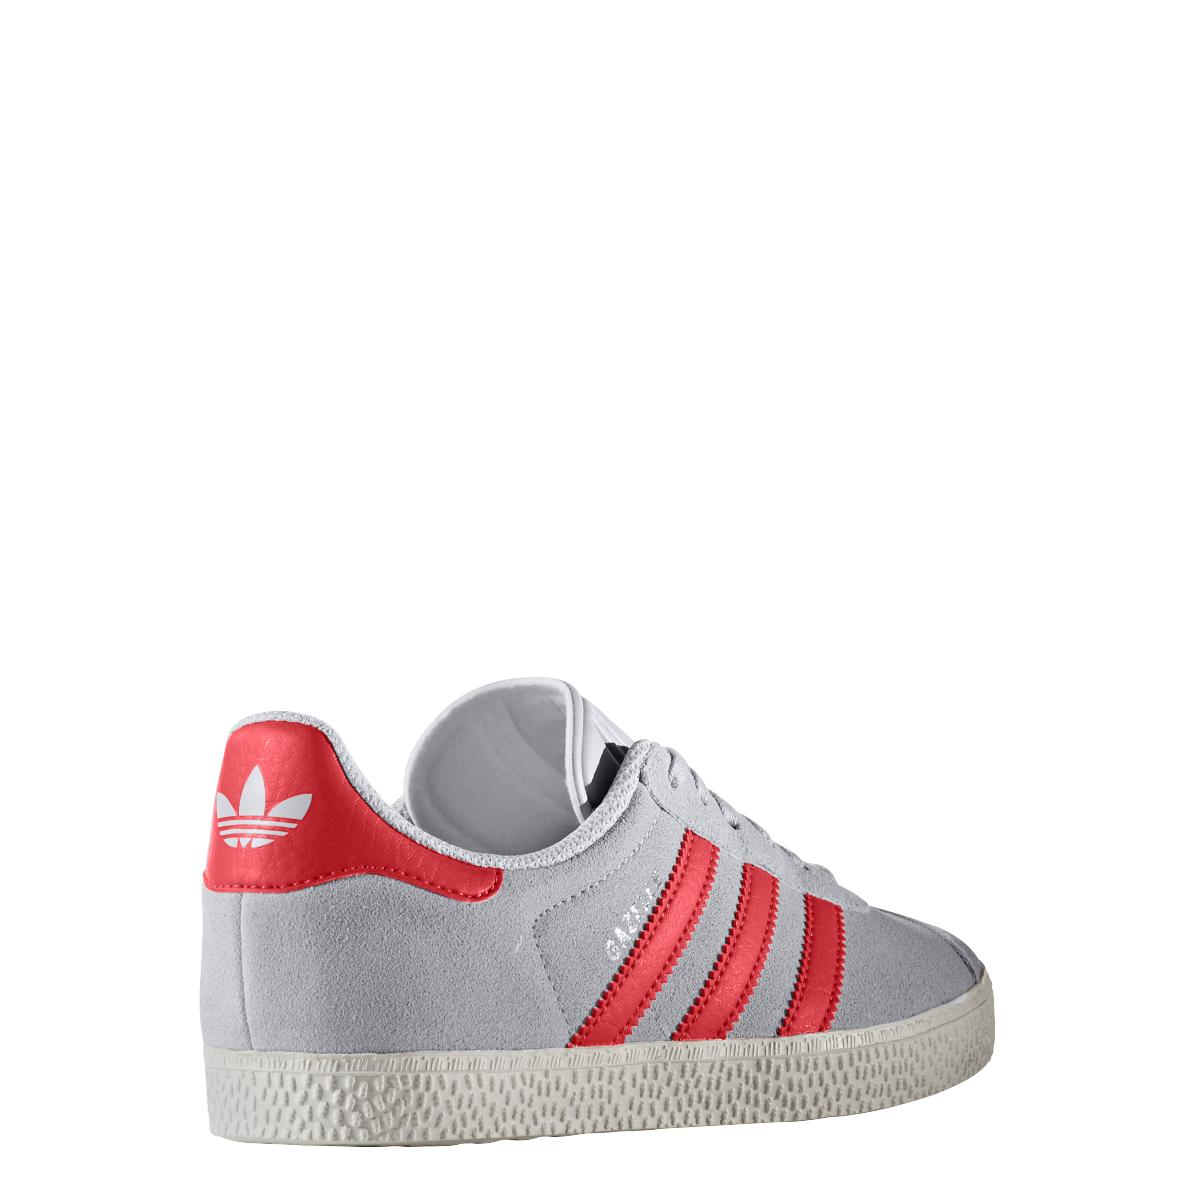 sport klingenmaier adidas originals gazelle sneaker kinder schuhe grau rot online kaufen. Black Bedroom Furniture Sets. Home Design Ideas